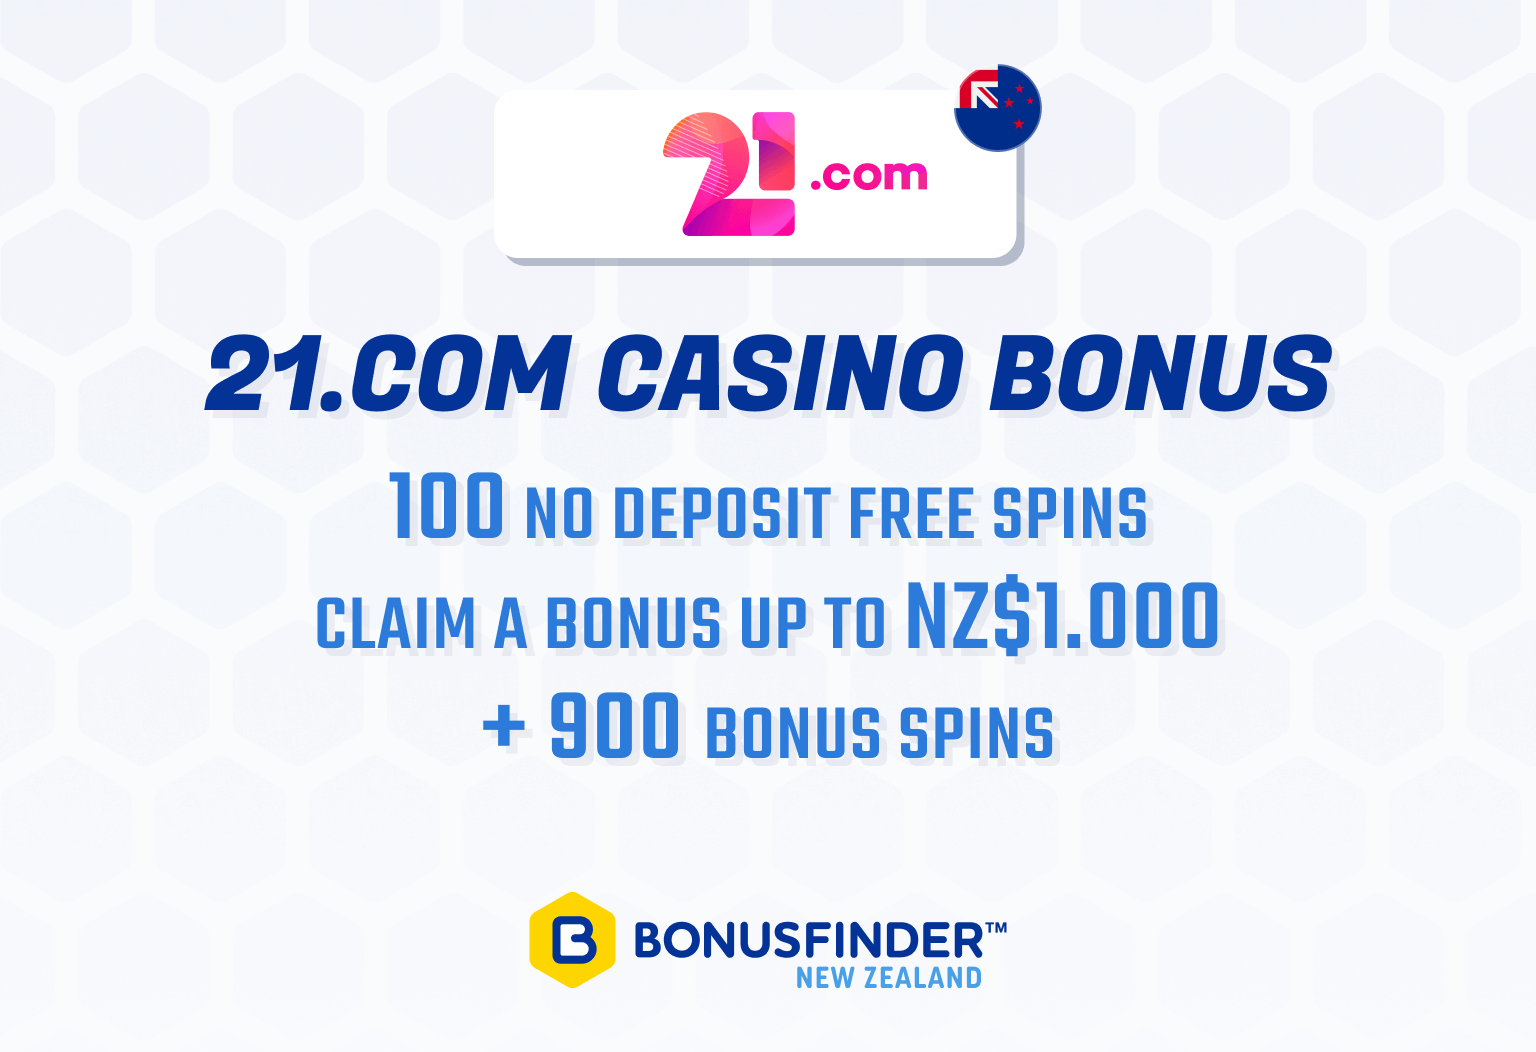 21.com bonus